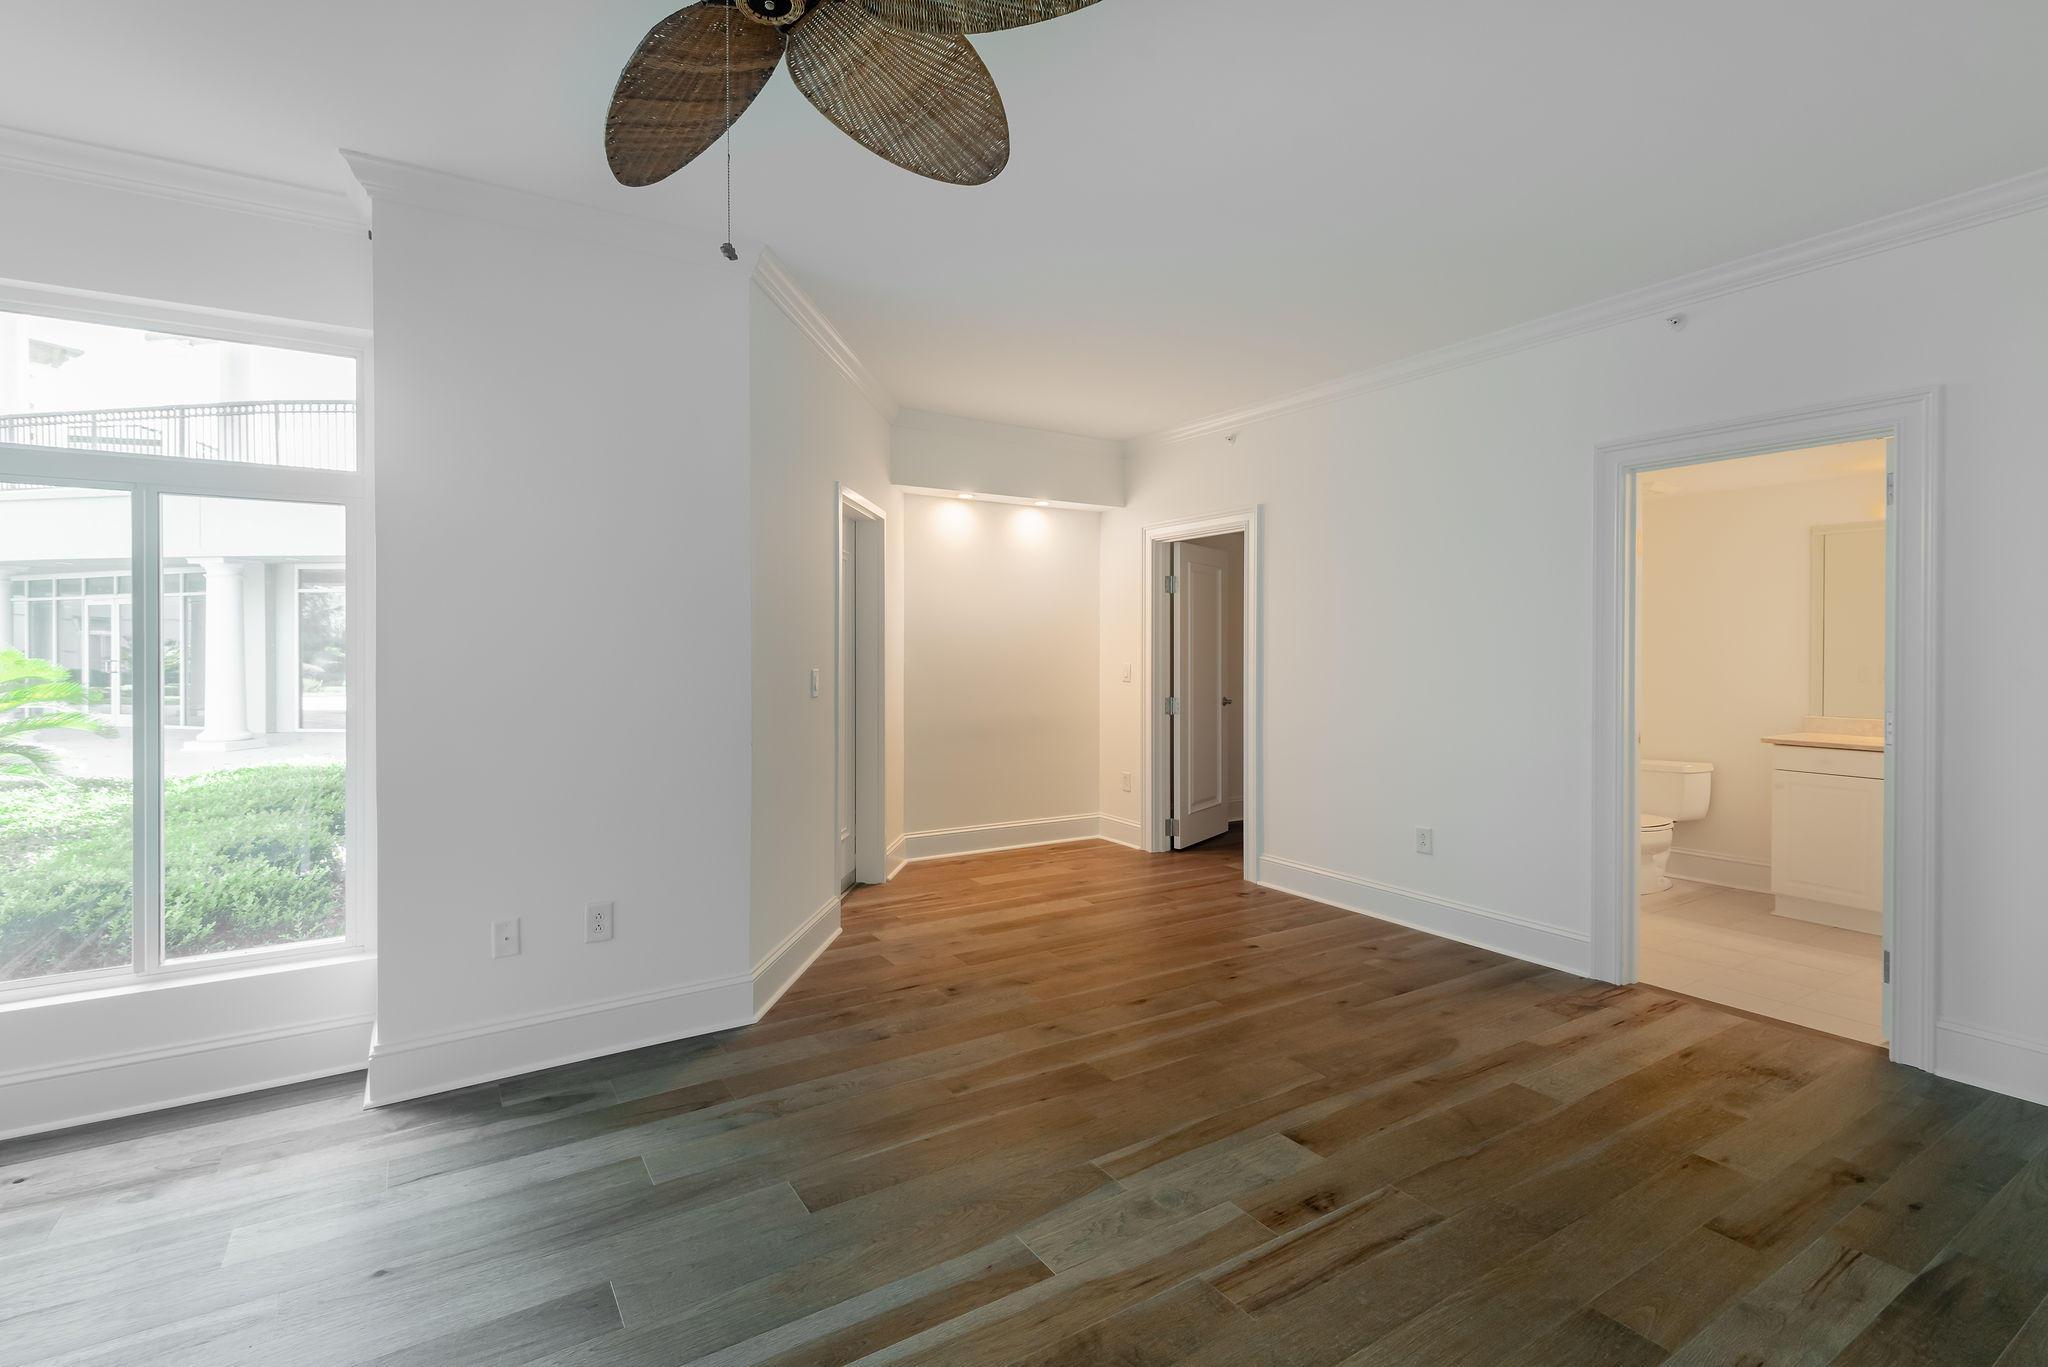 Renaissance On Chas Harbor Homes For Sale - 211 Plaza, Mount Pleasant, SC - 36